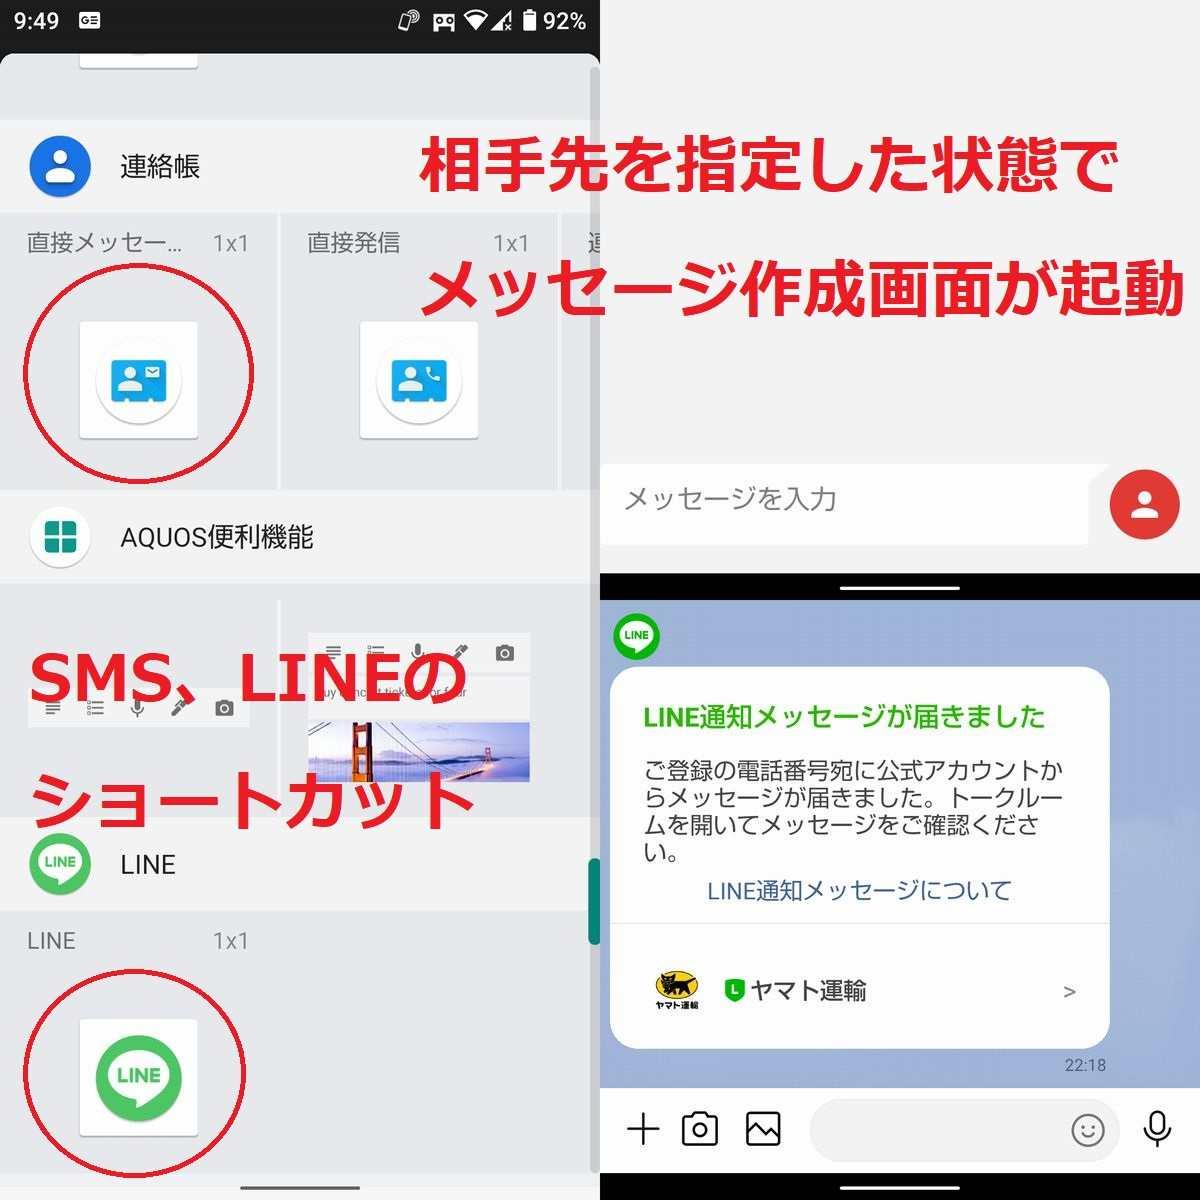 SM、LINEのウィジェット(ショートカット)